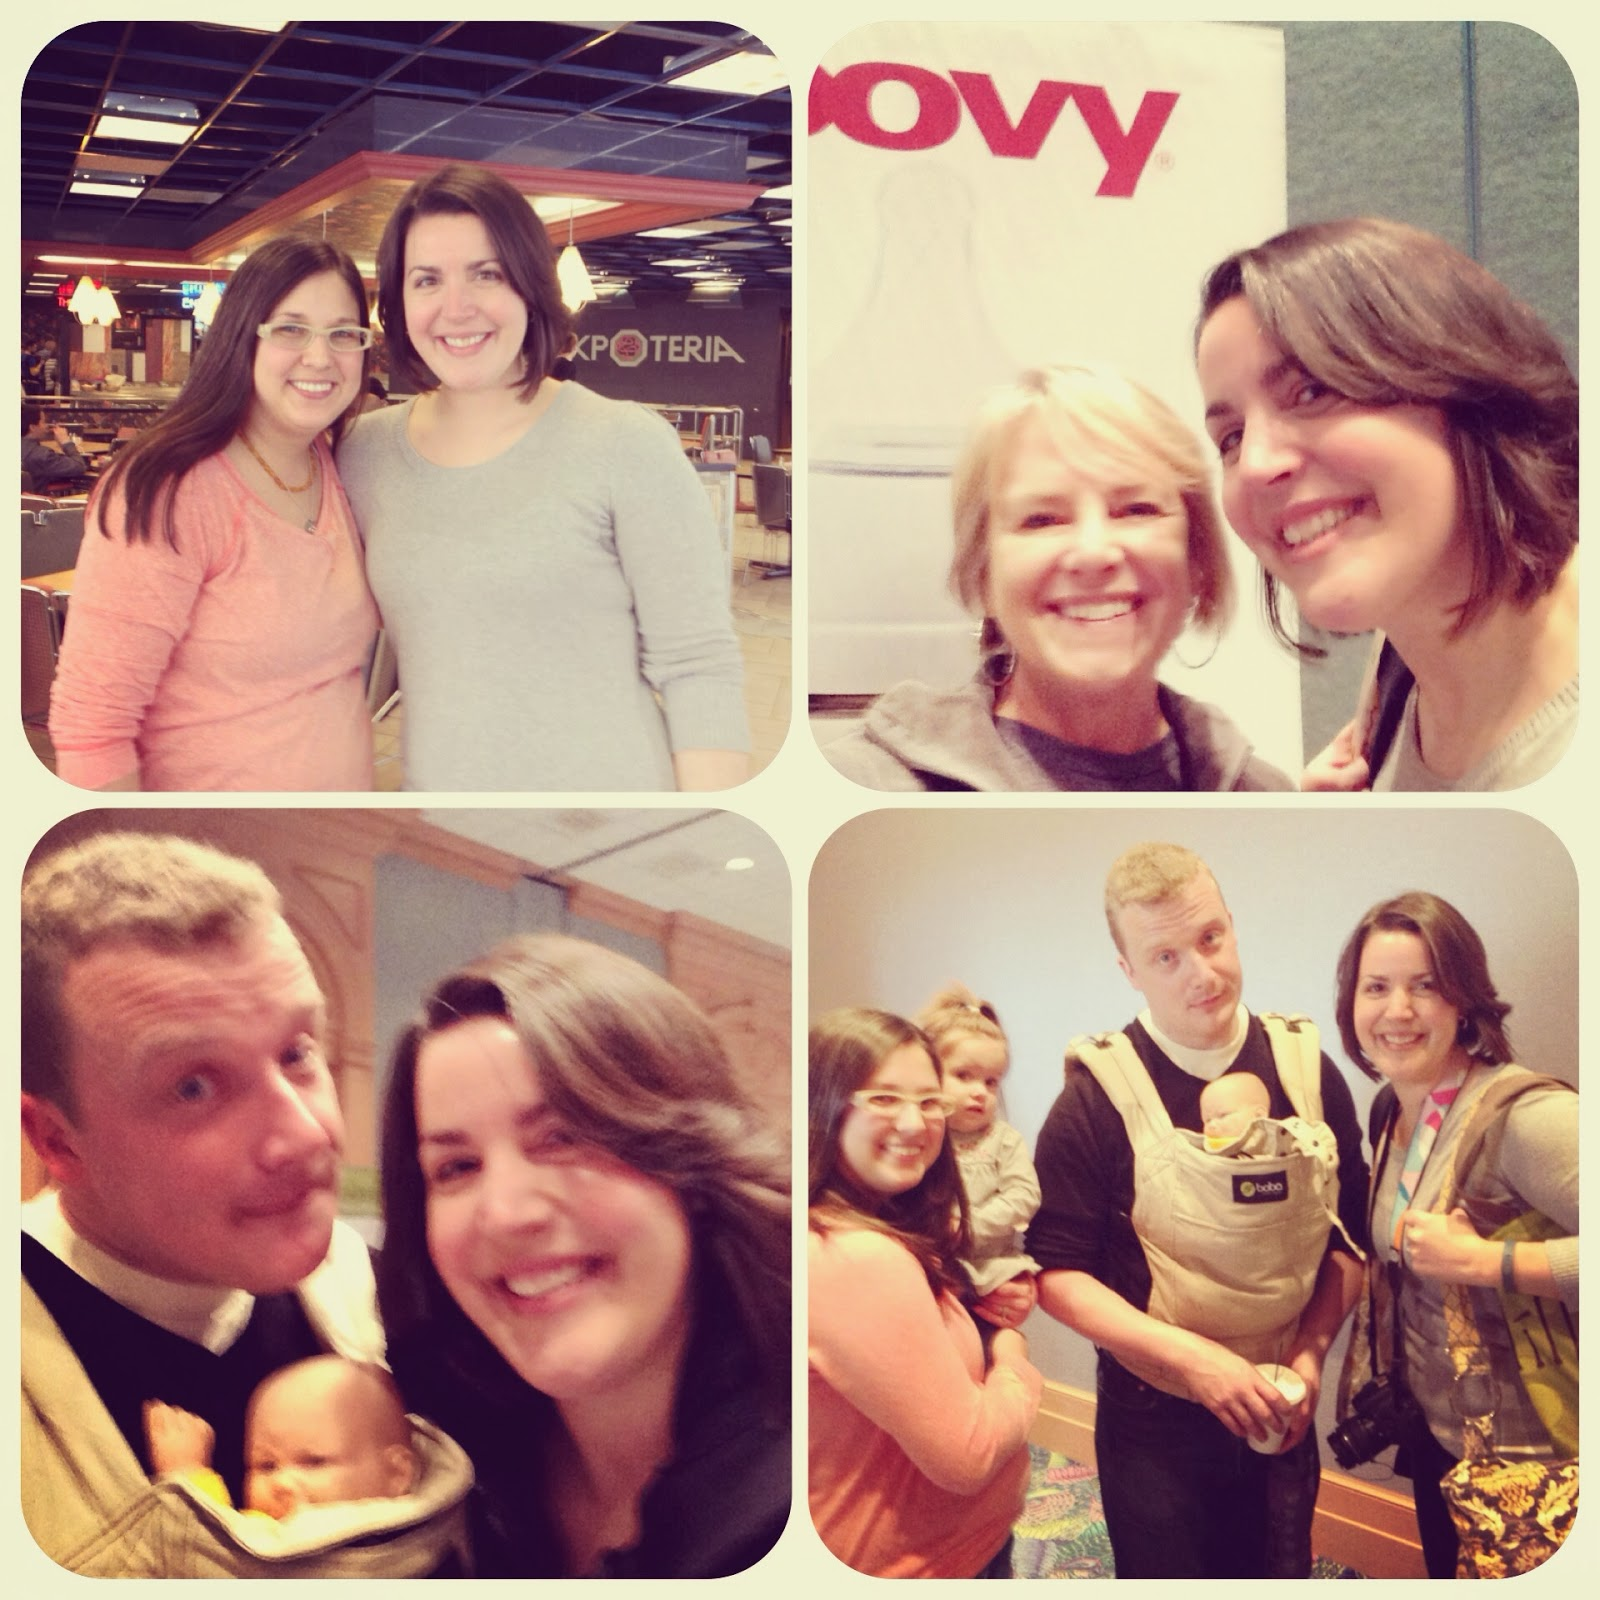 2014 #MommyCon #MommyConChicago #HappeningsoftheHarperHousehold #TheBabyGuyNYC #MomMart #Joovy